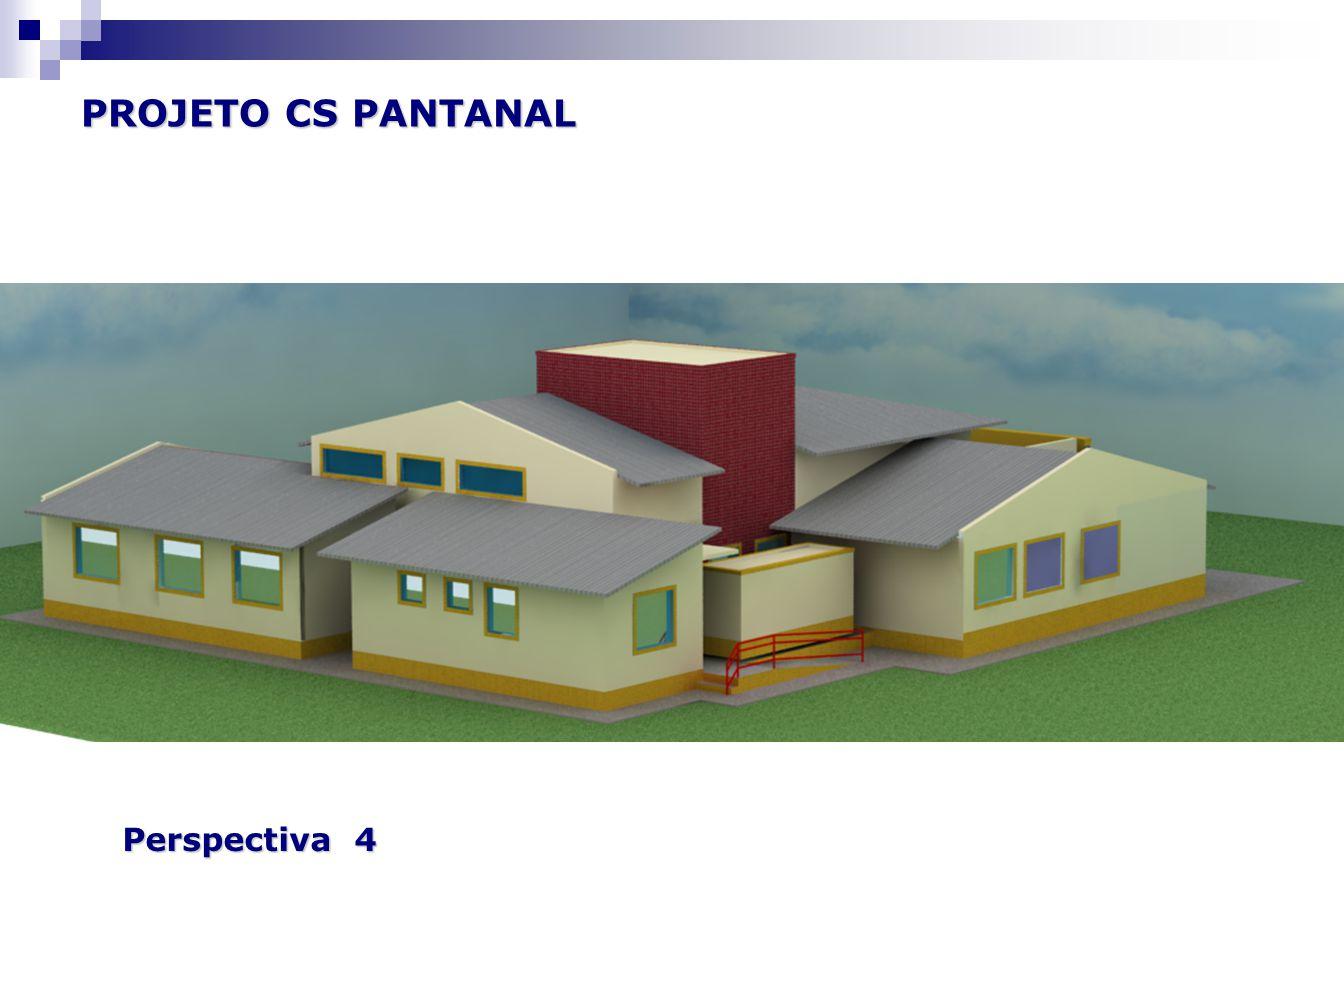 PROJETO CS PANTANAL Perspectiva 4